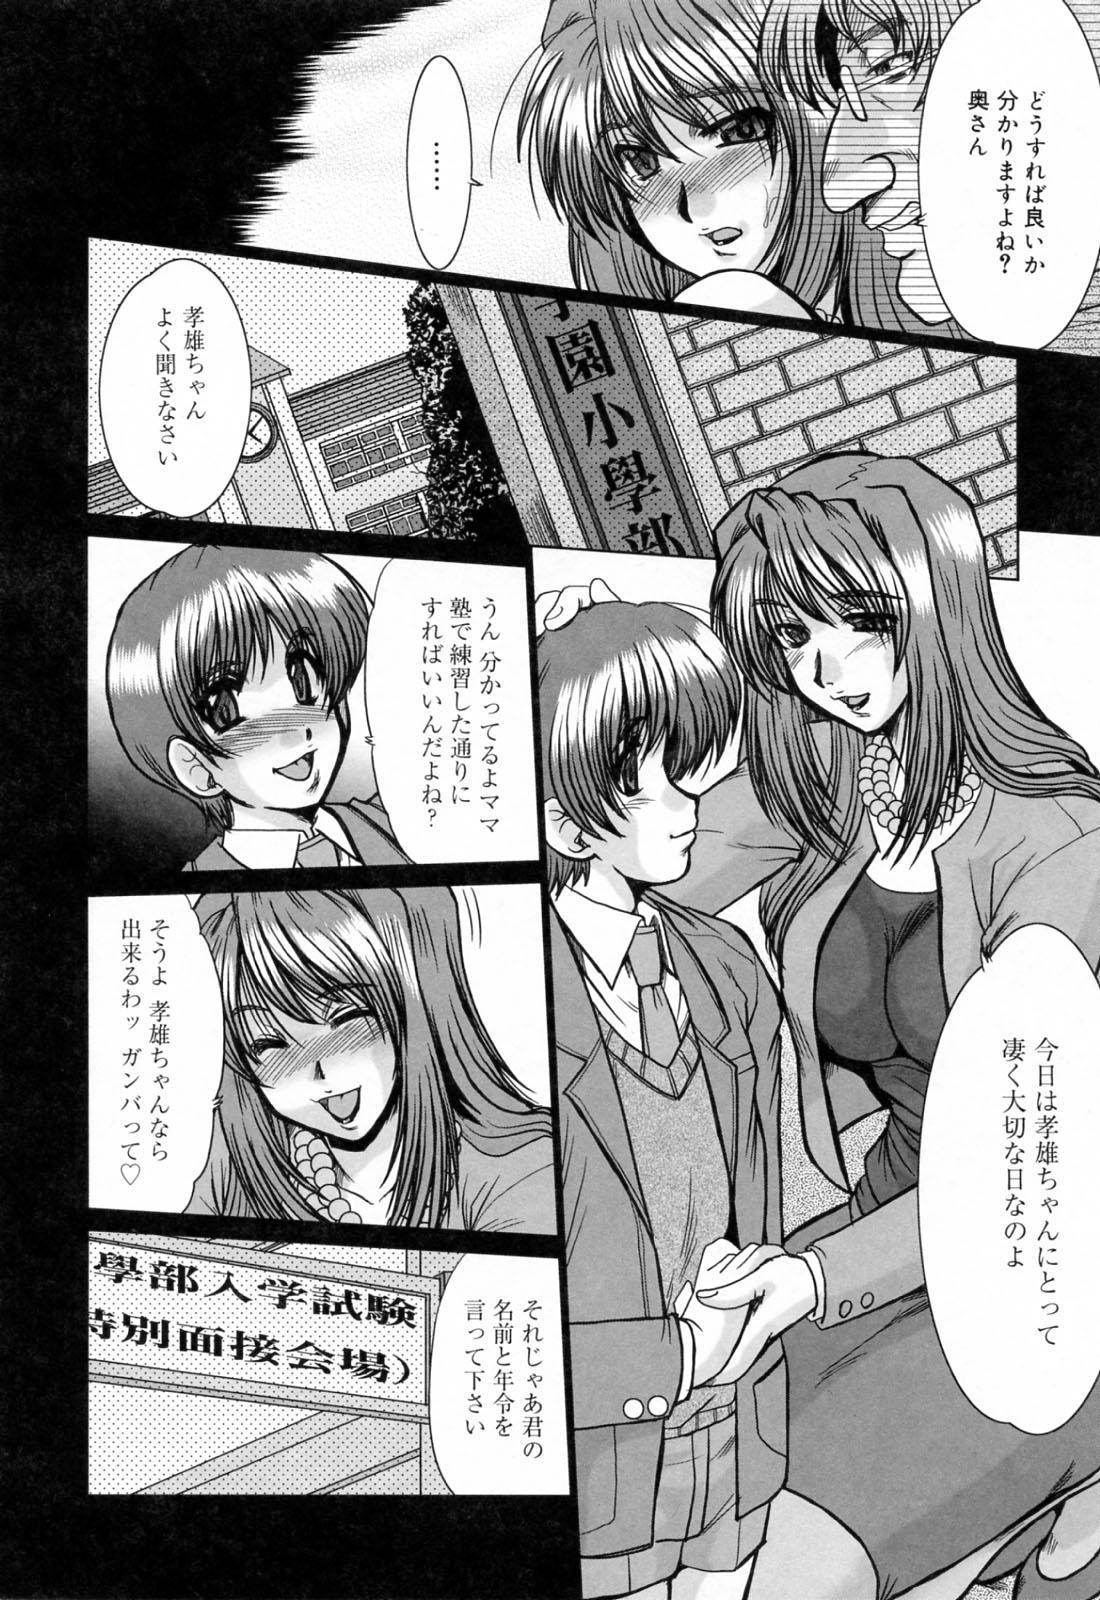 Kanjuku Hitozuma Nikki - The diary of the mature married woman 139